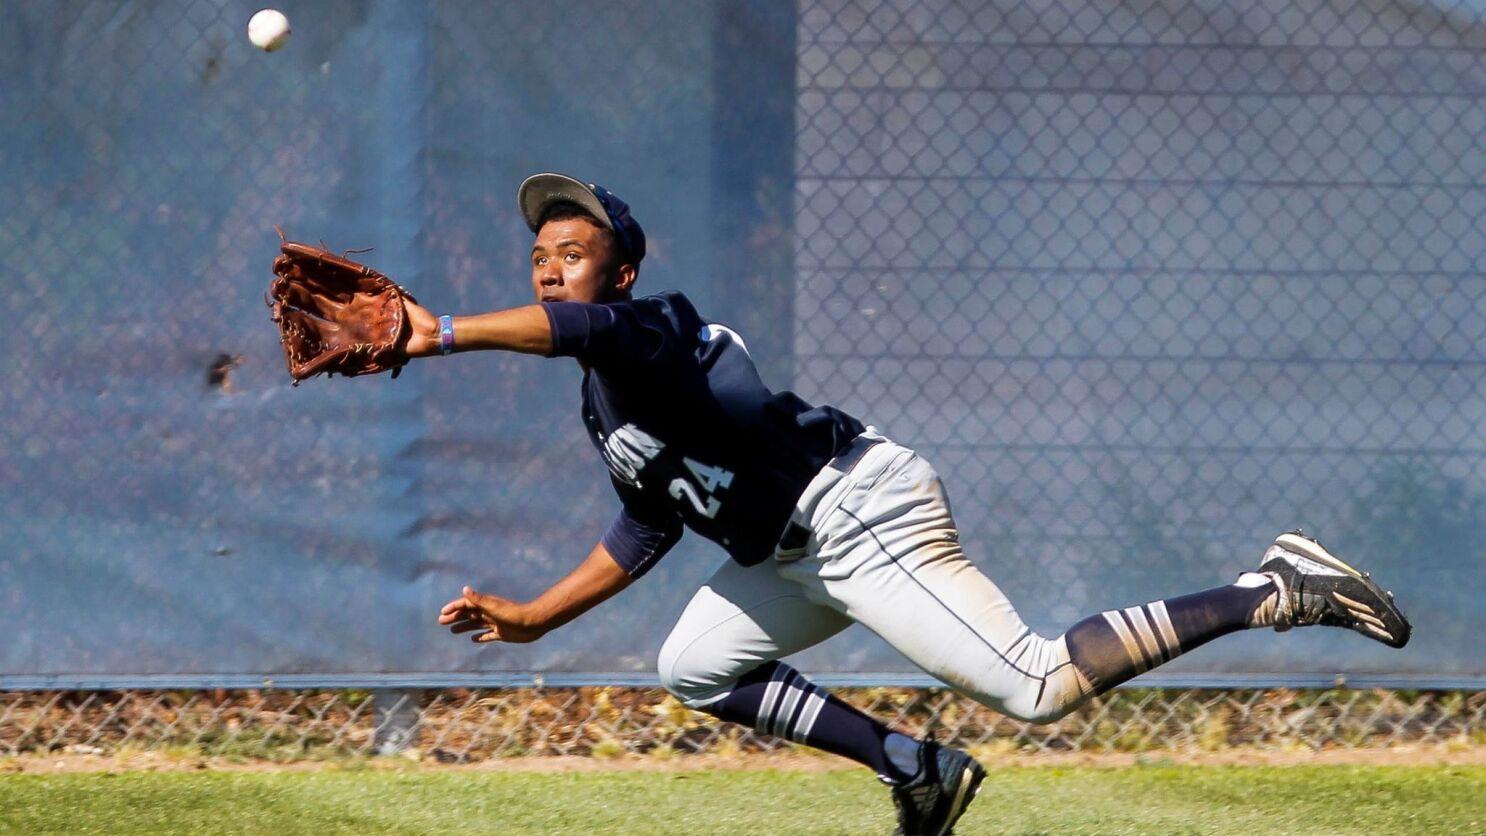 d16db1260d6bc Union-Tribune honors 7,844 student-athletes - The San Diego Union-Tribune